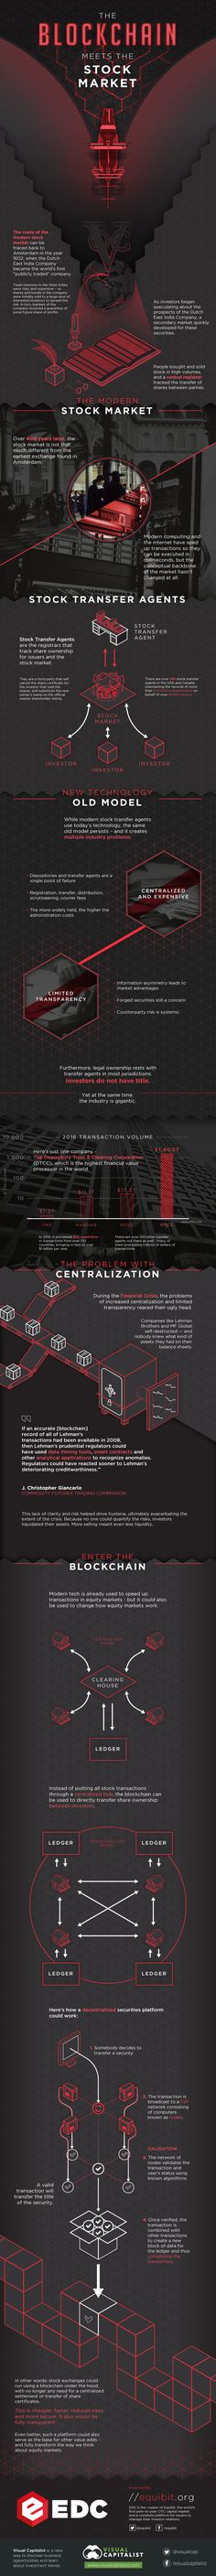 Blockchain  Combining with Stock Market